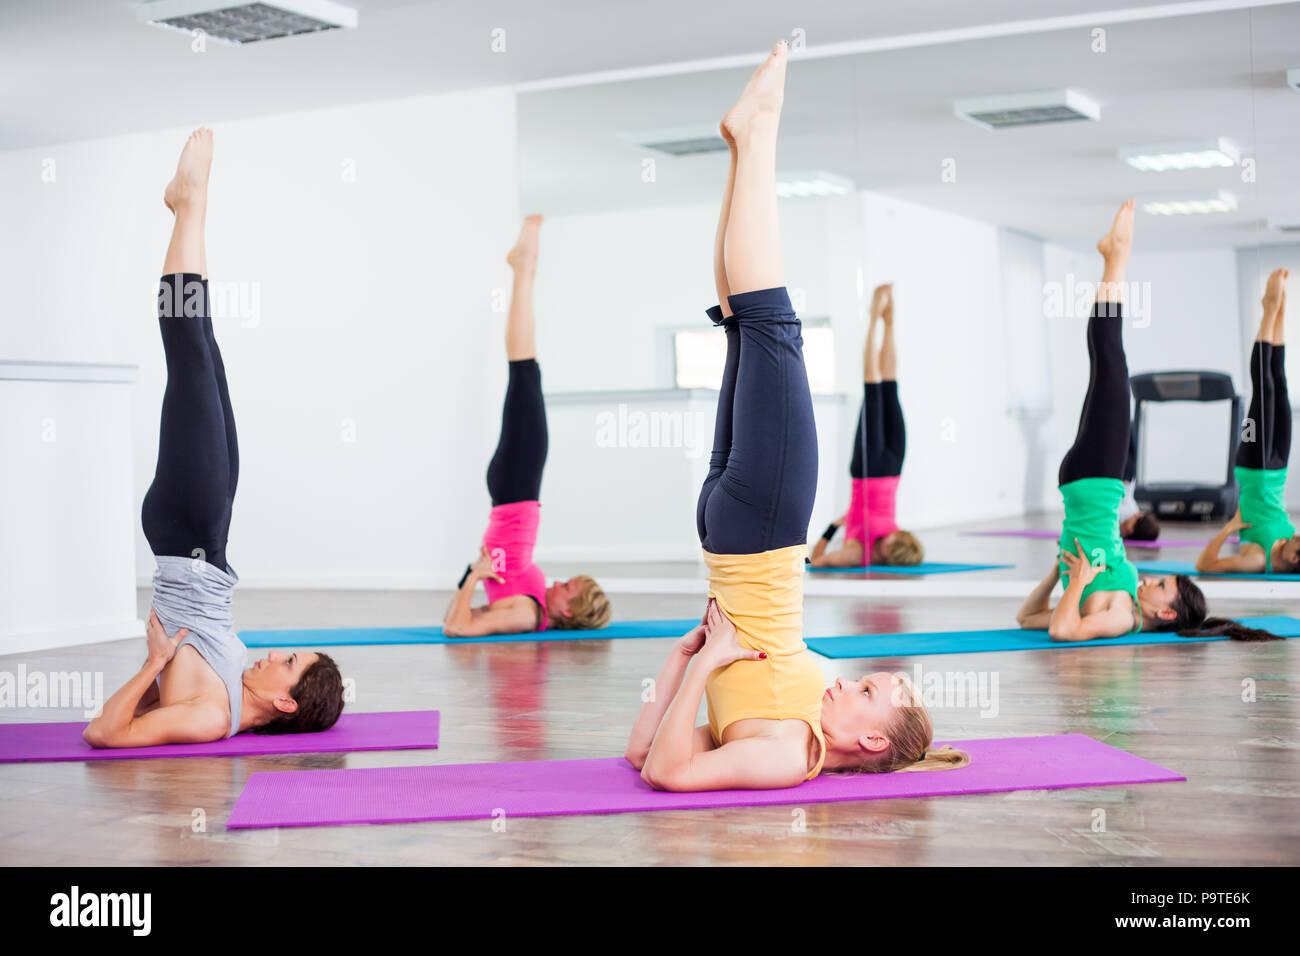 Quatre jeunes filles pratiquant le yoga, Salamba Sarvangasana / stand d'épaule Photo Stock